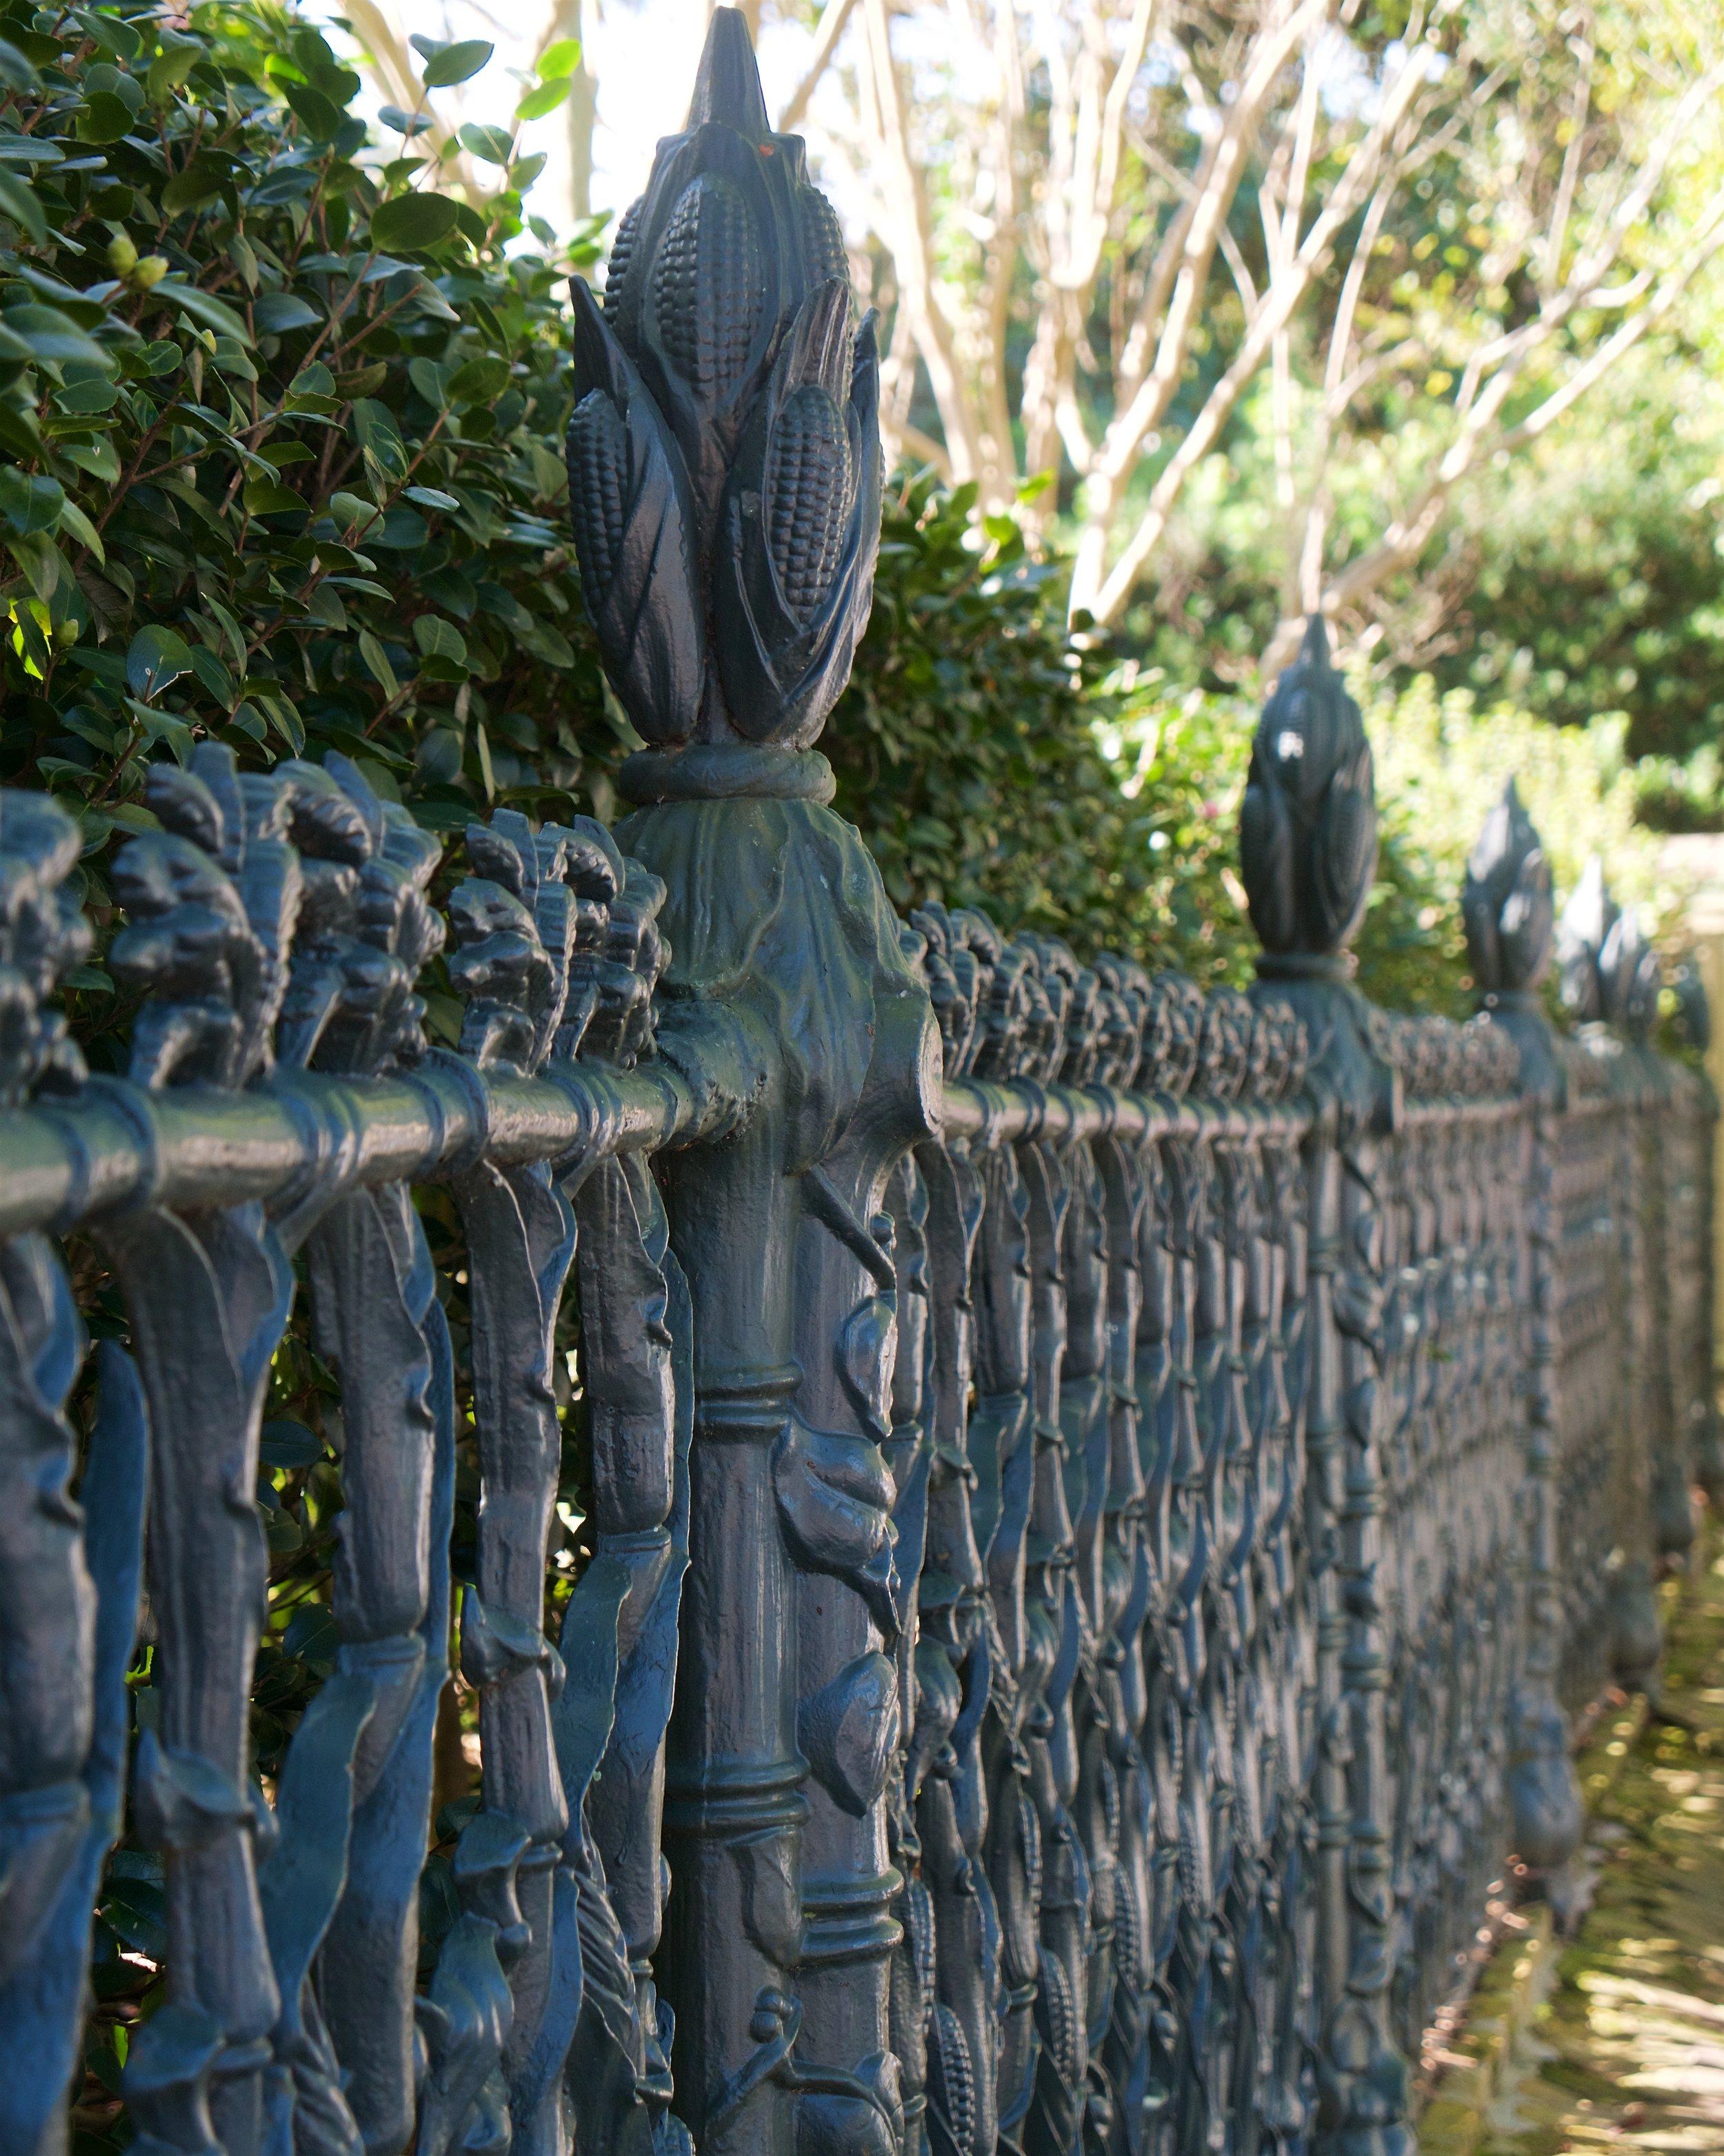 Corn stalk fence